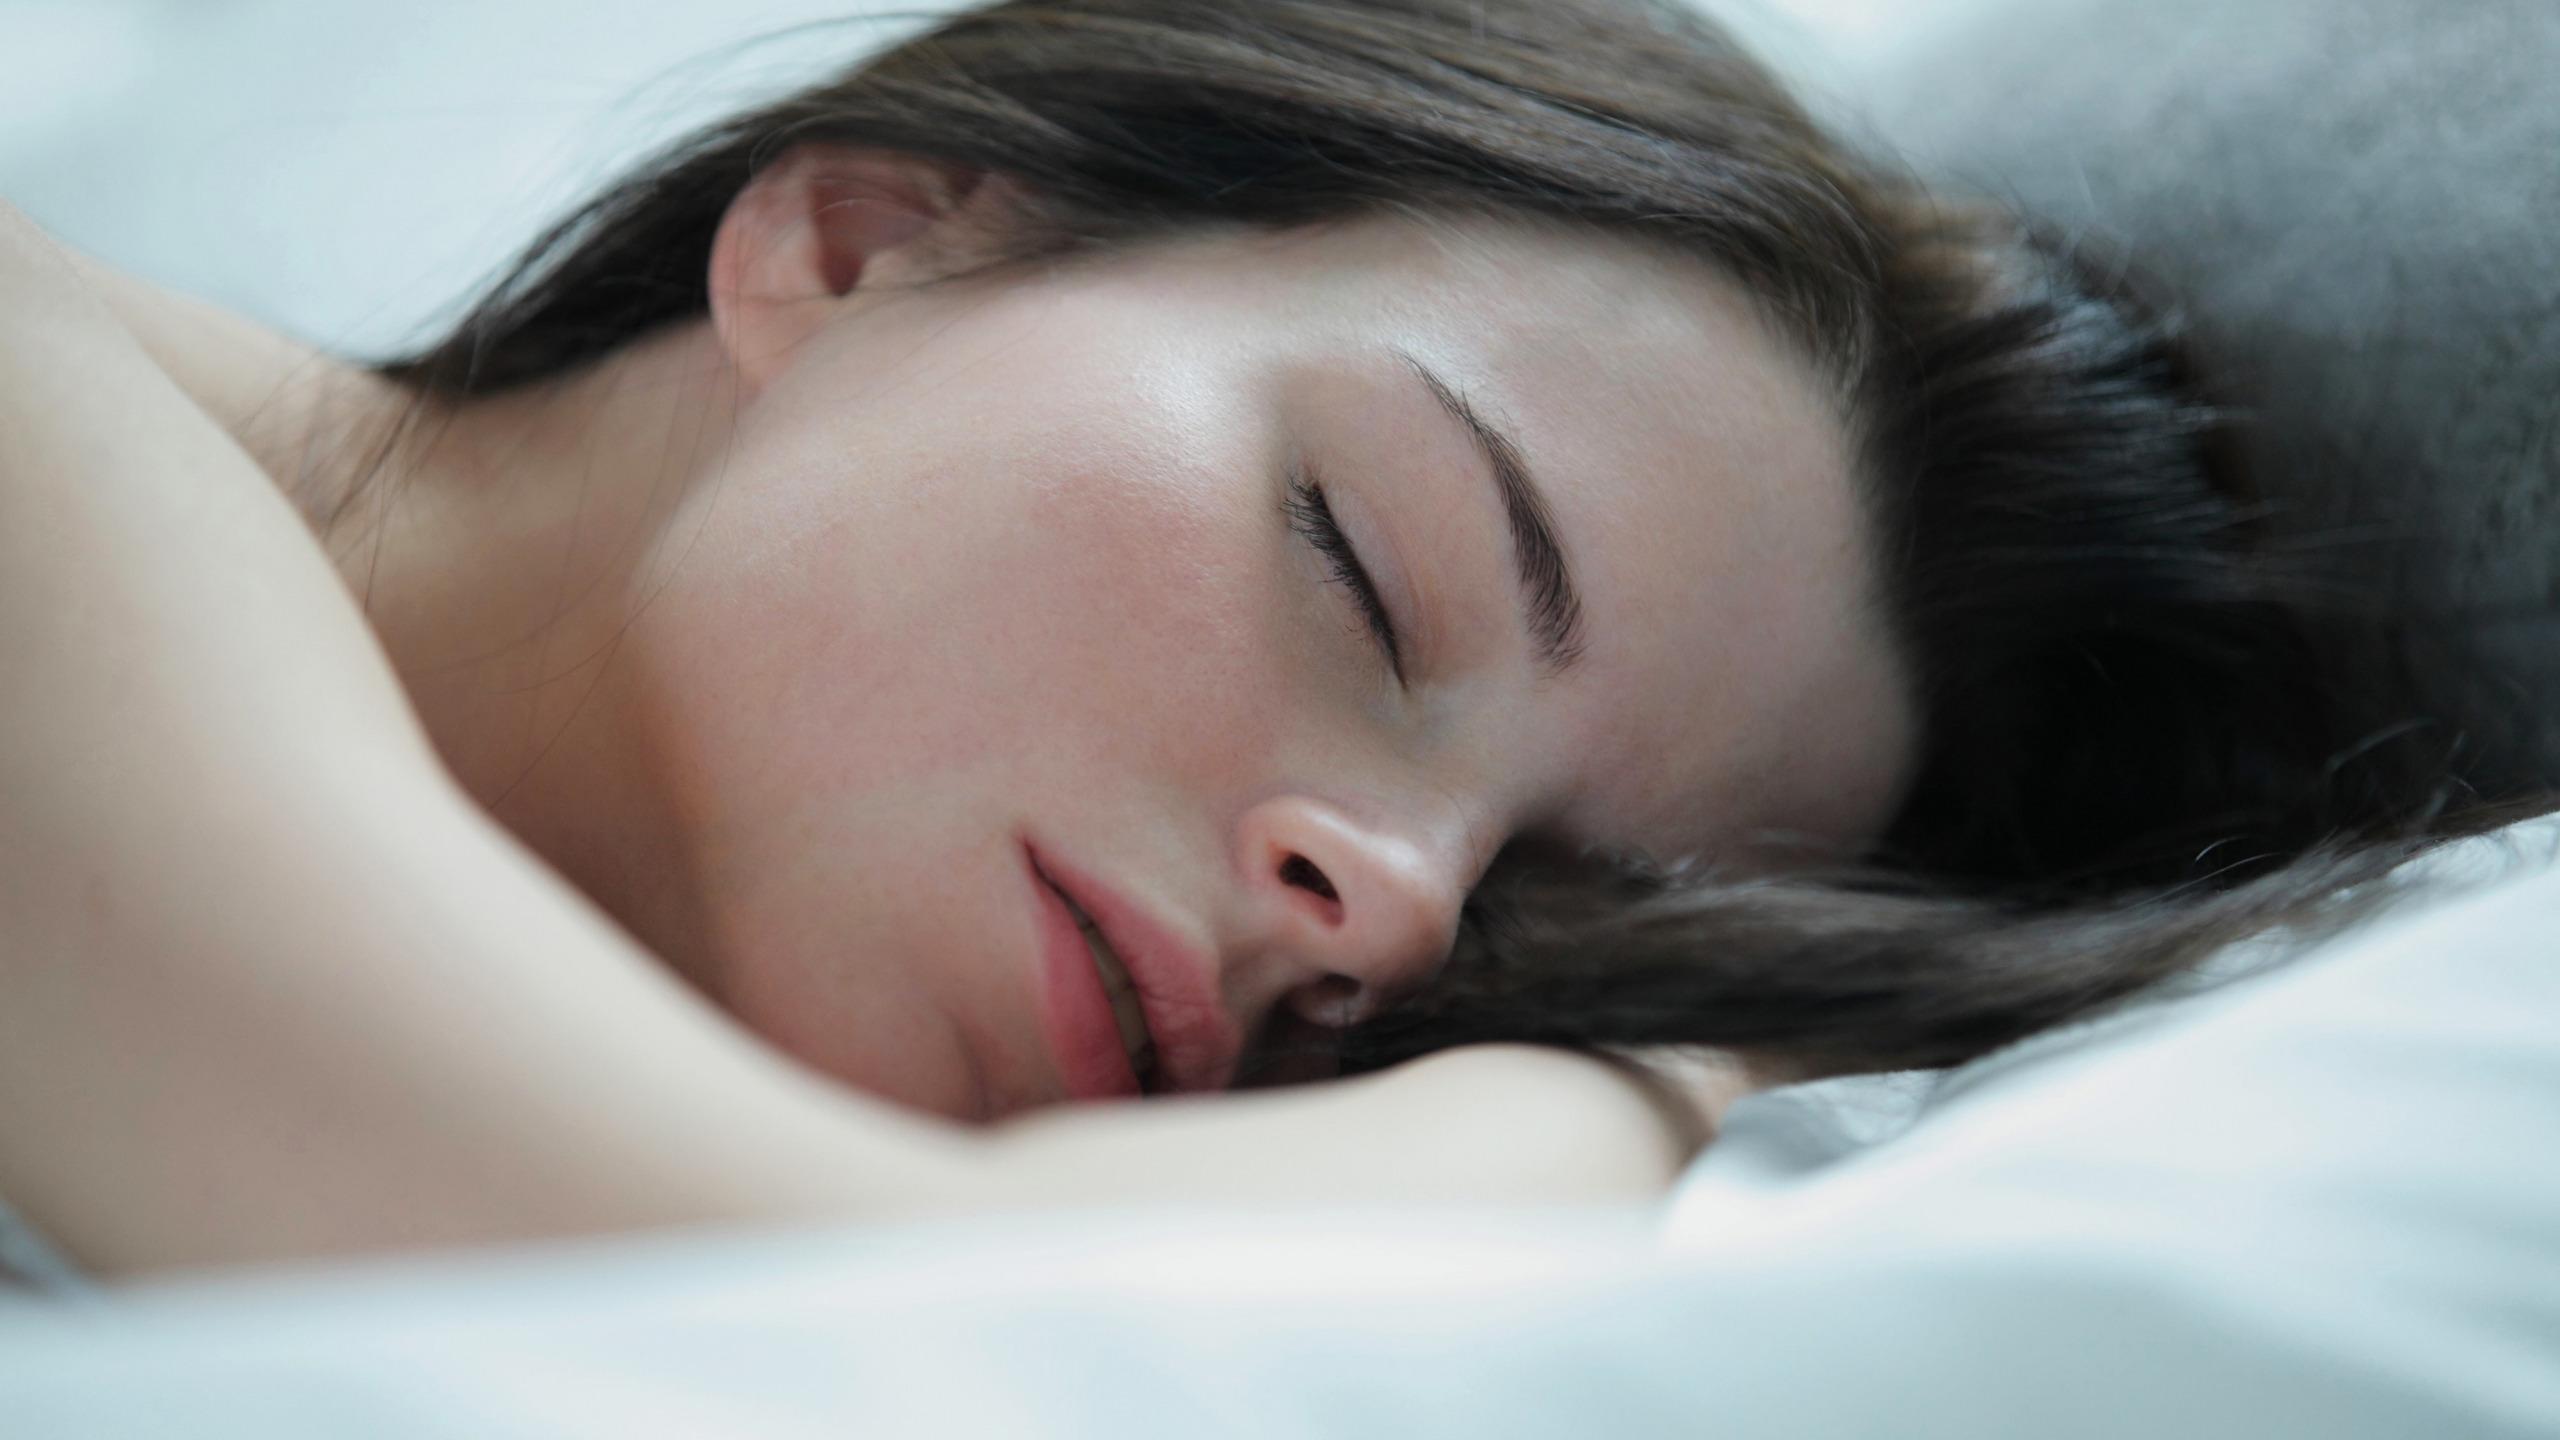 girl-asleep-in-bed-cock-pics-guitar